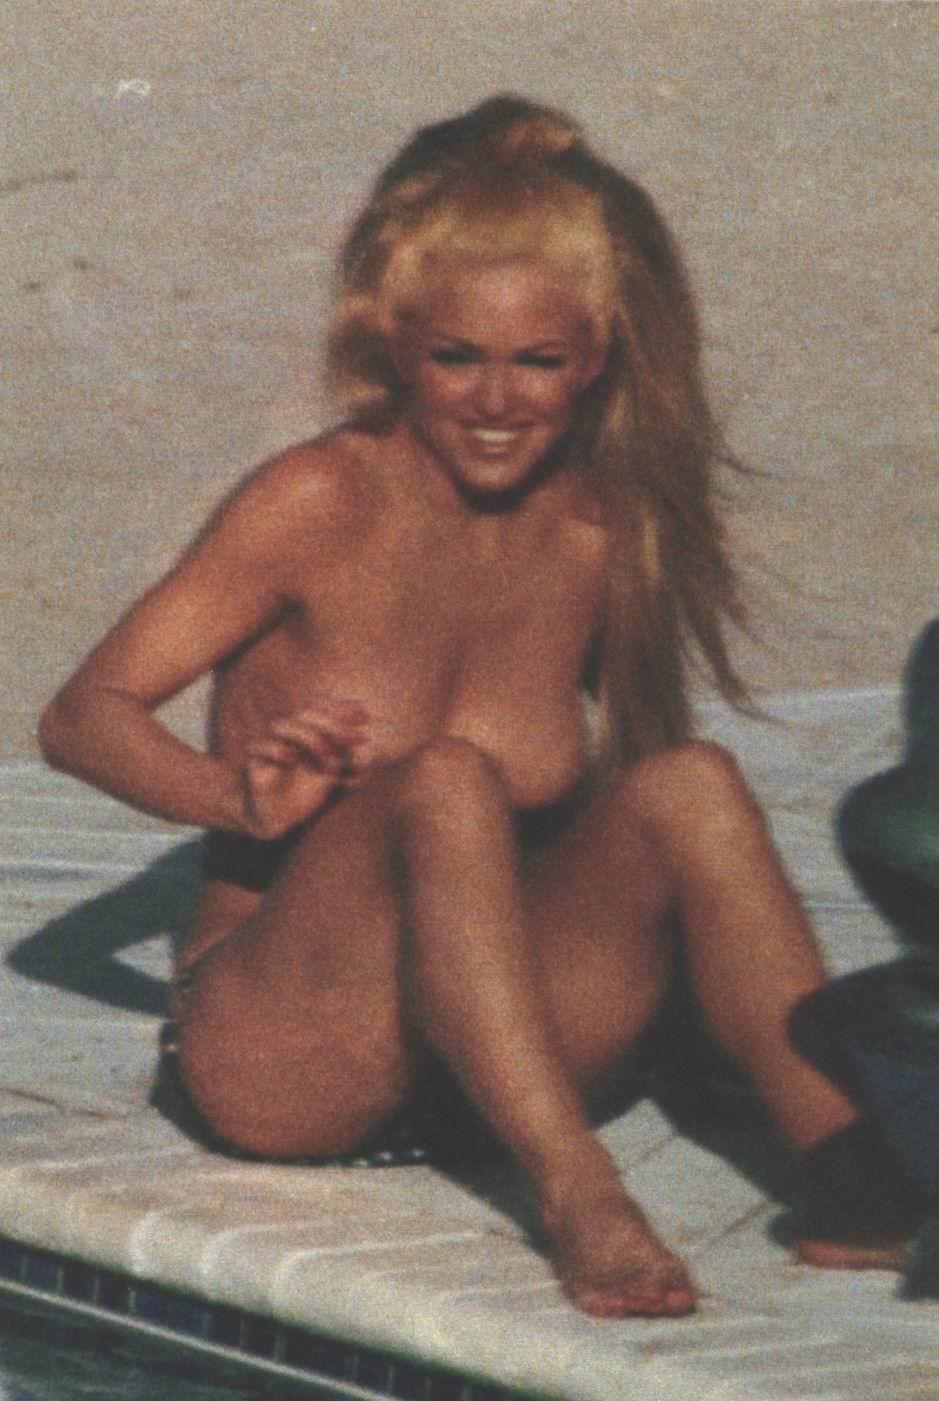 image Madonna body of evidence